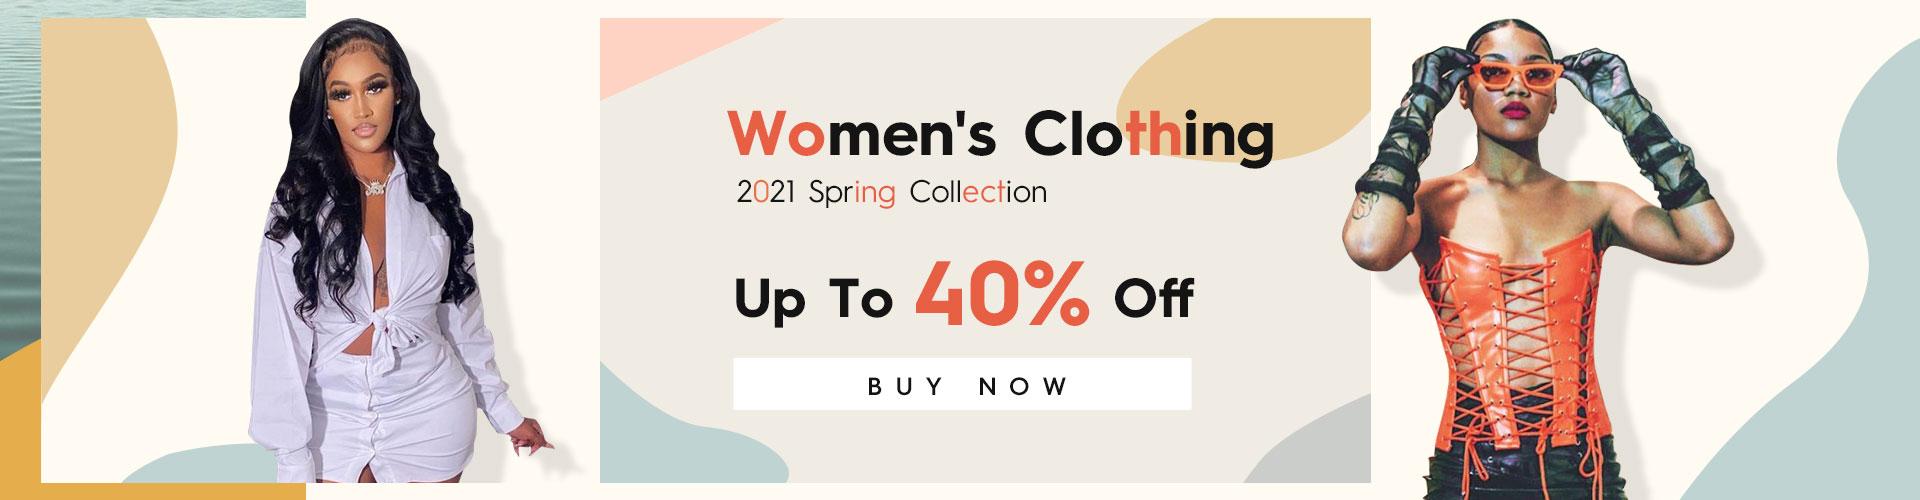 Wholesale 7 discount